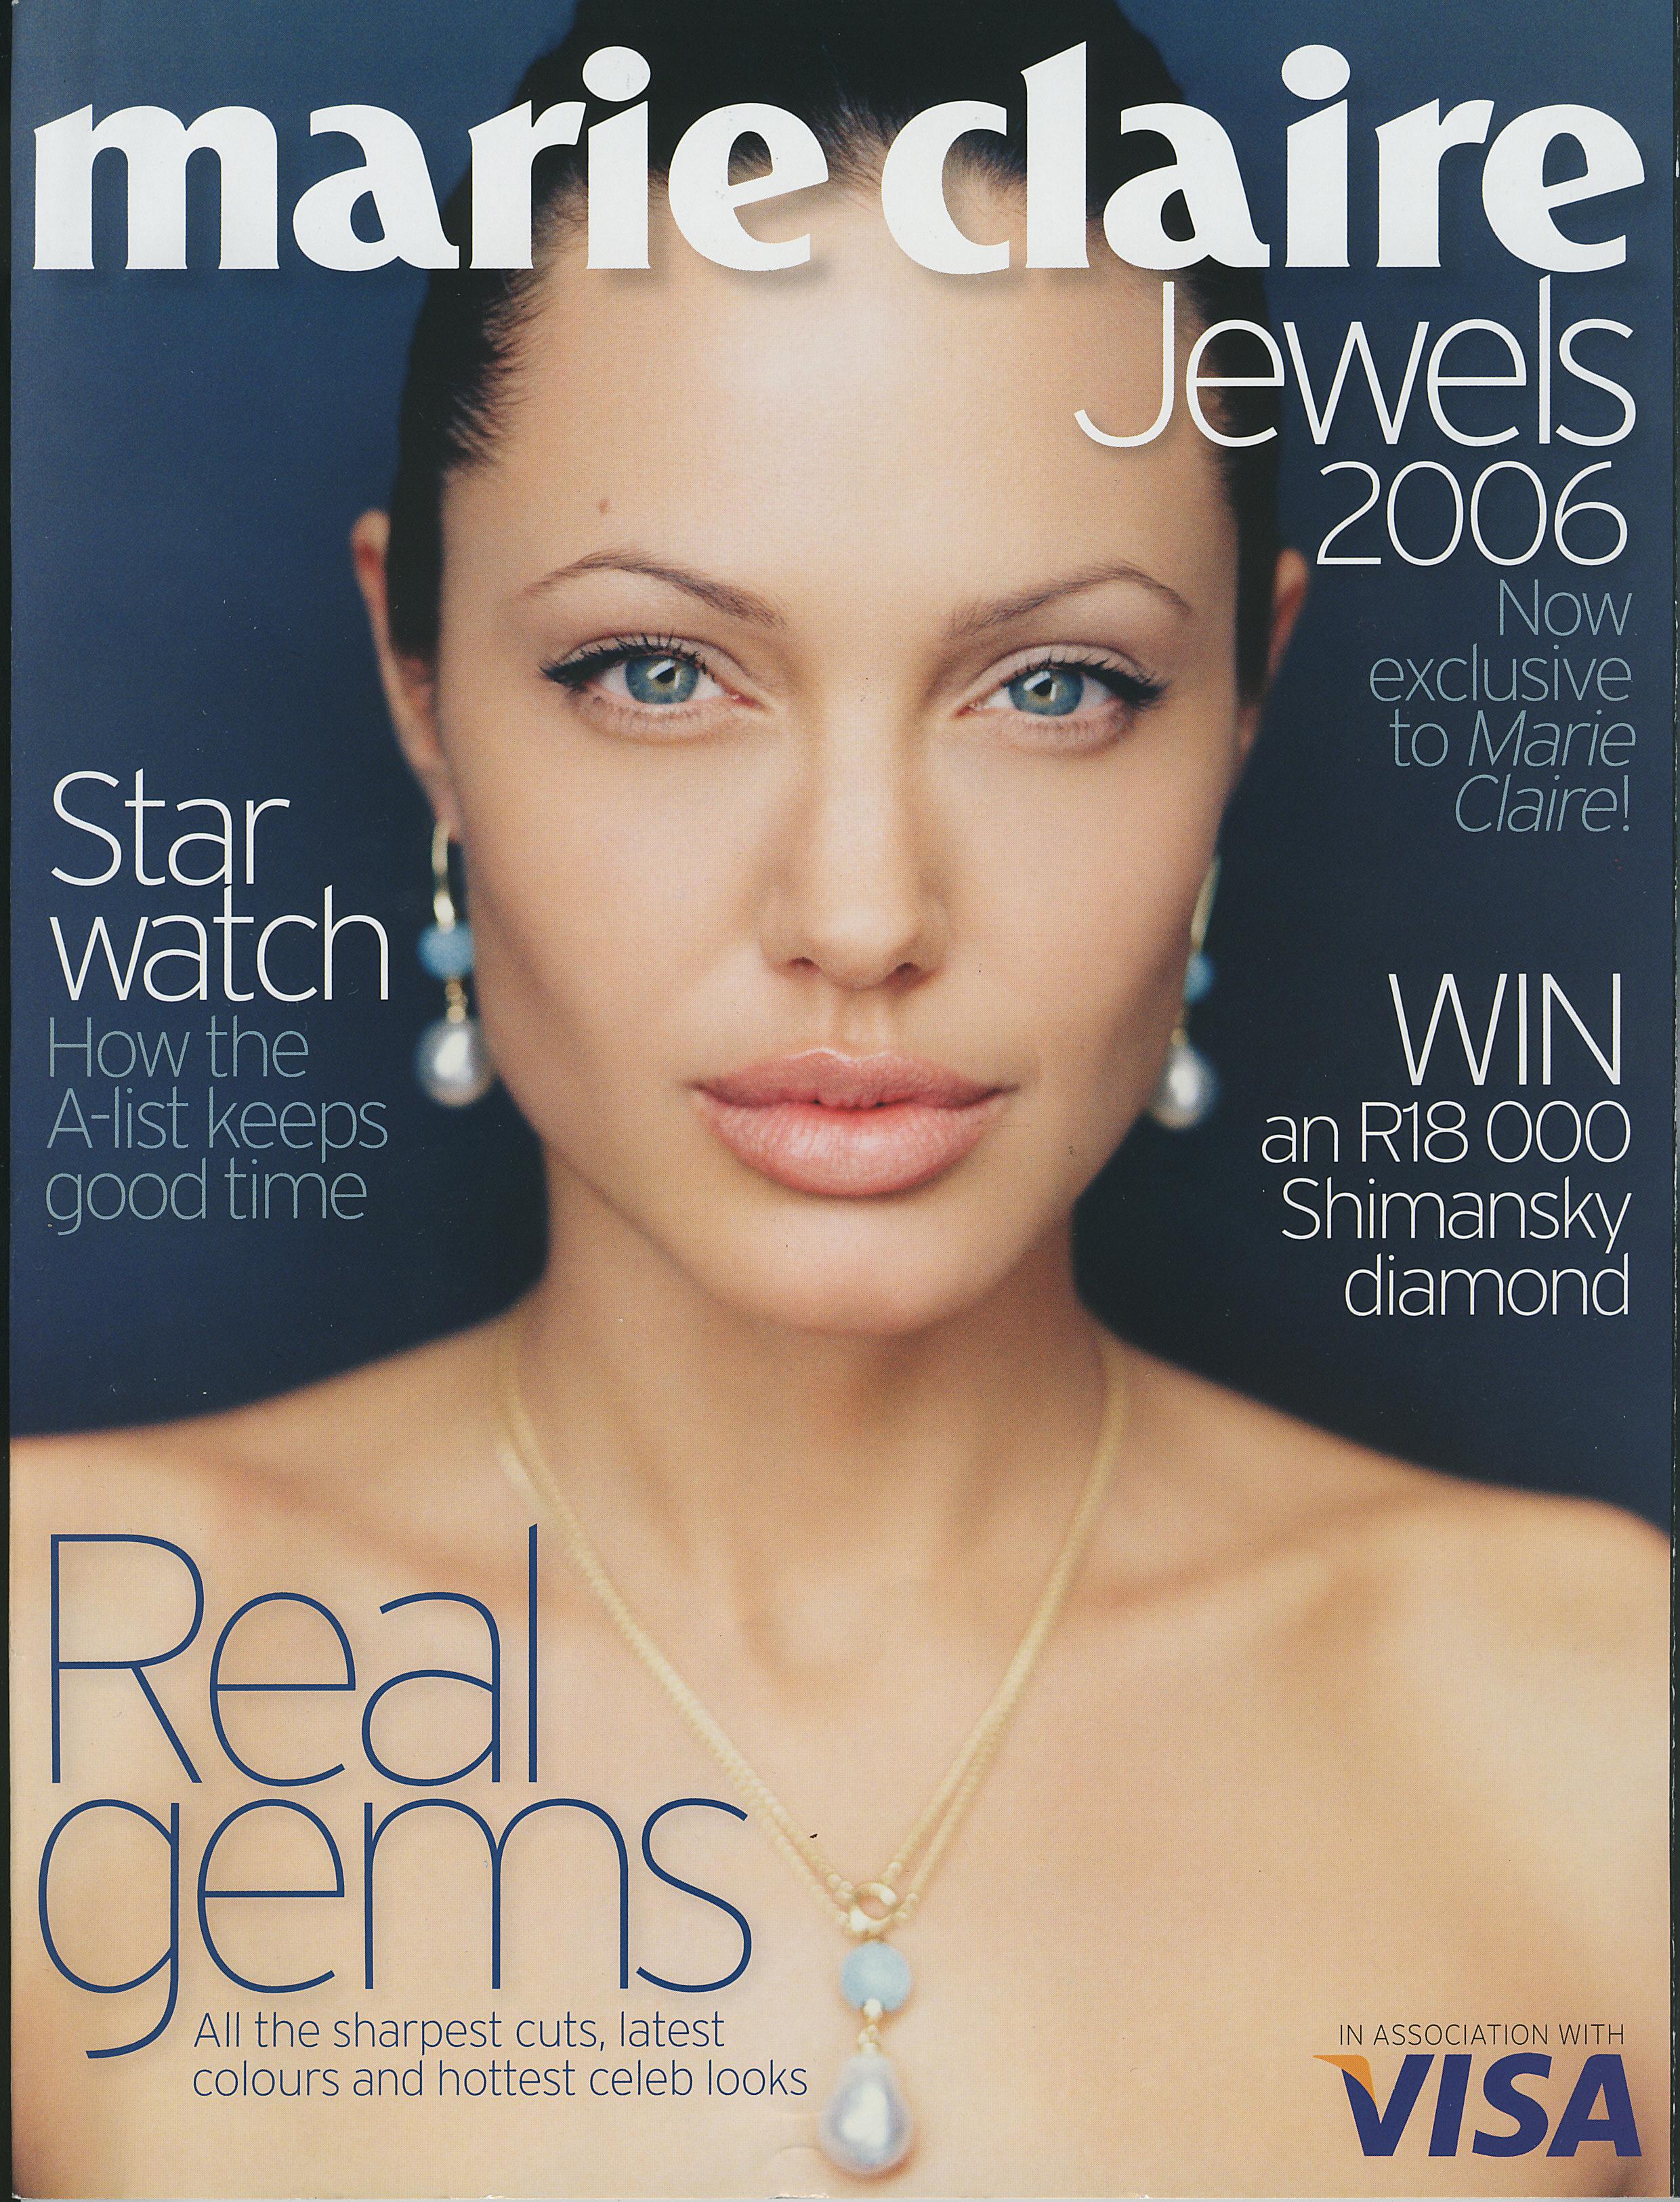 MARIE CLAIRE JEWELS DEC 2006